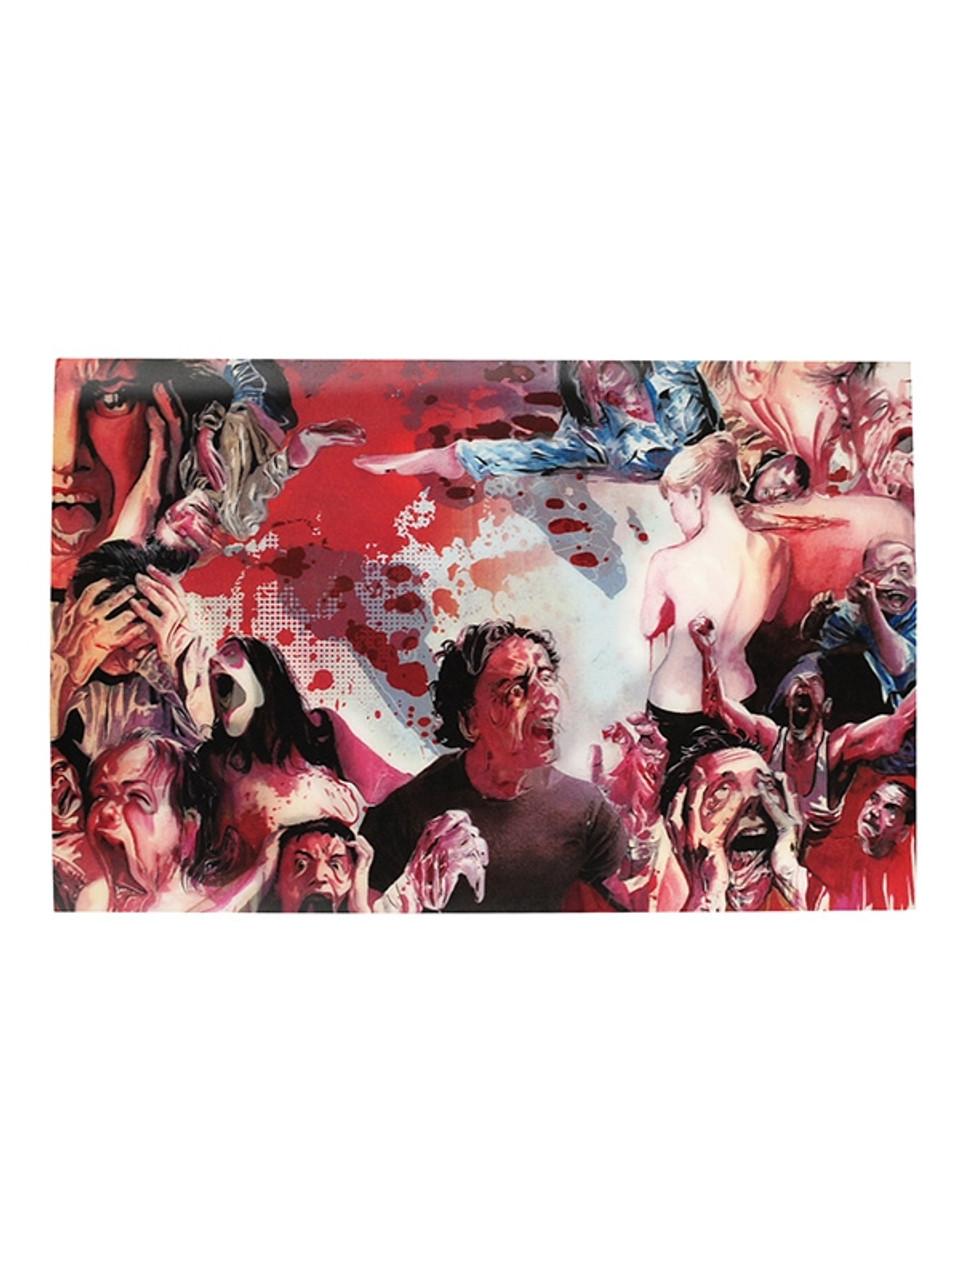 "J.N. Williamson ""Illustrated Masques"" Signed Lettered Edition, Stephen King, Clive Barker"